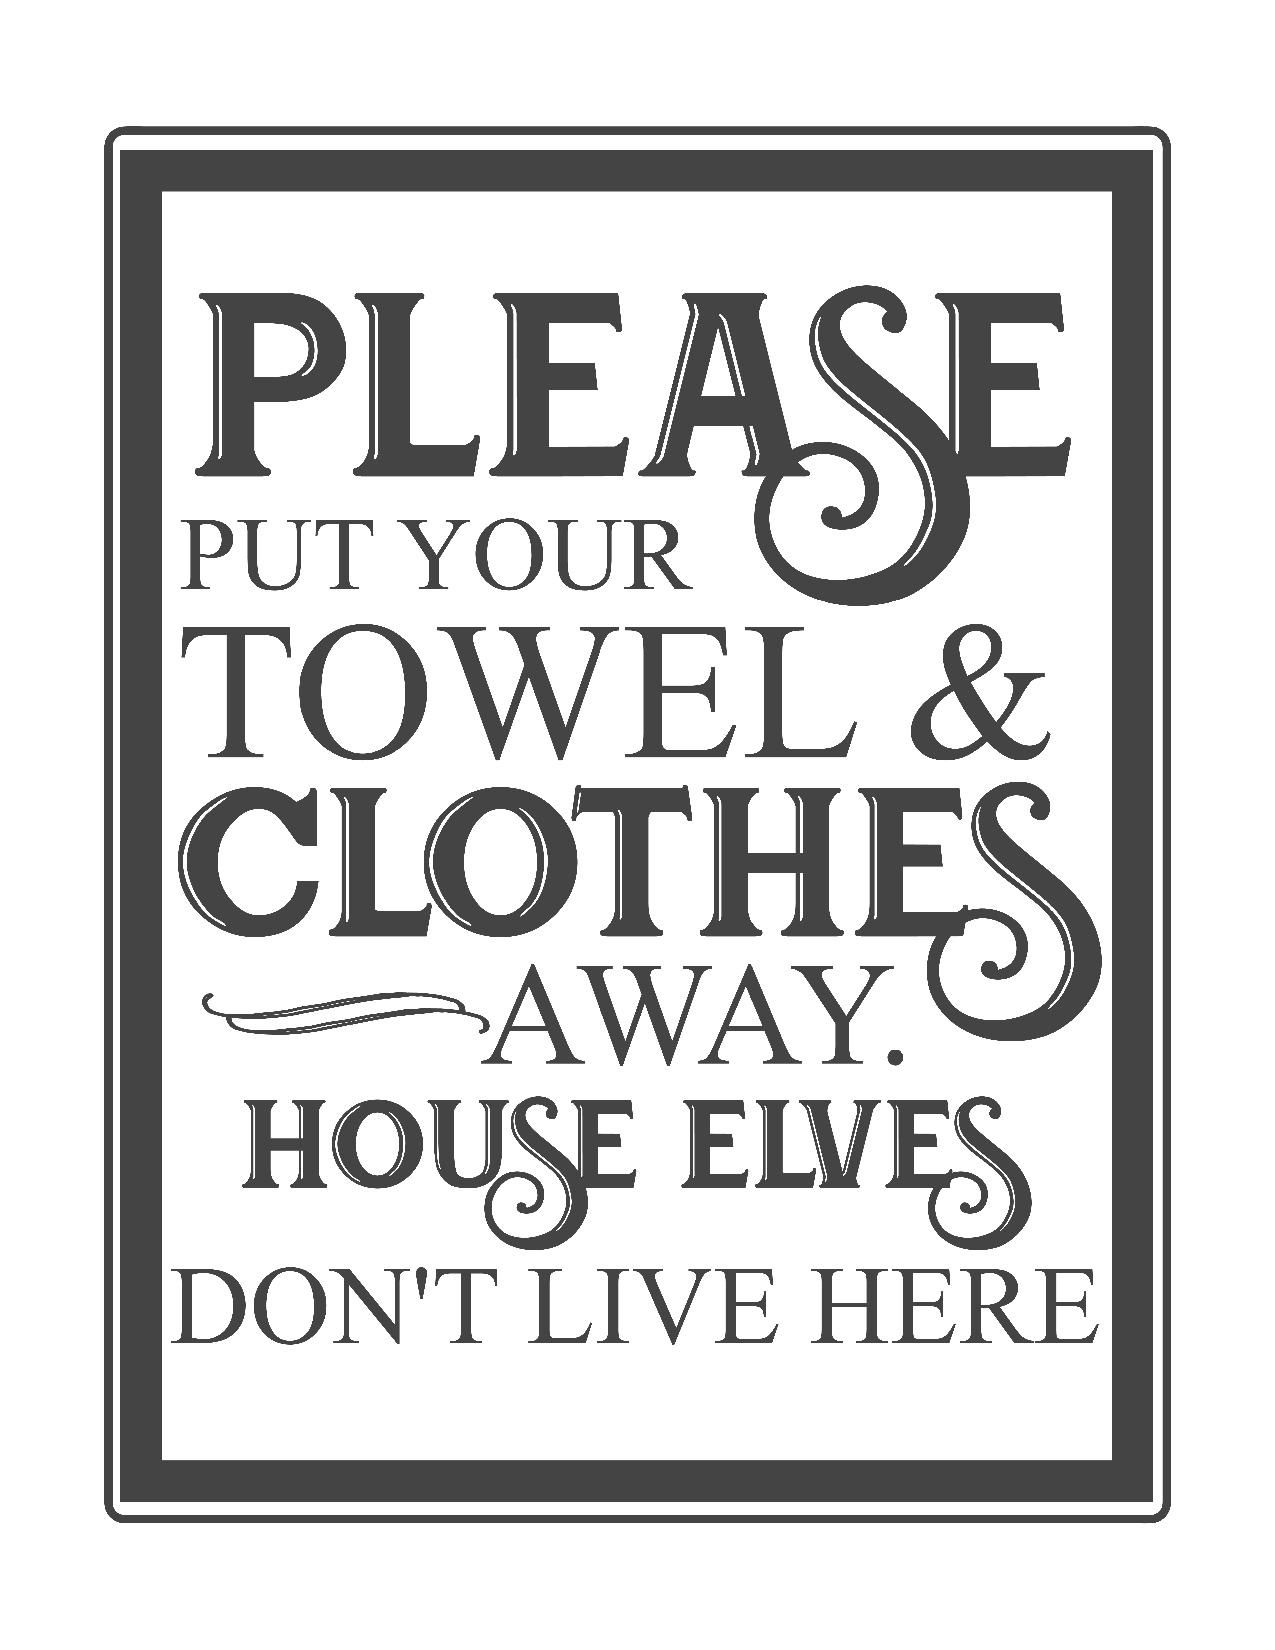 Free Vintage Bathroom Printables | Hobbies And Crafts | Pinterest - Free Printable Bathroom Quotes